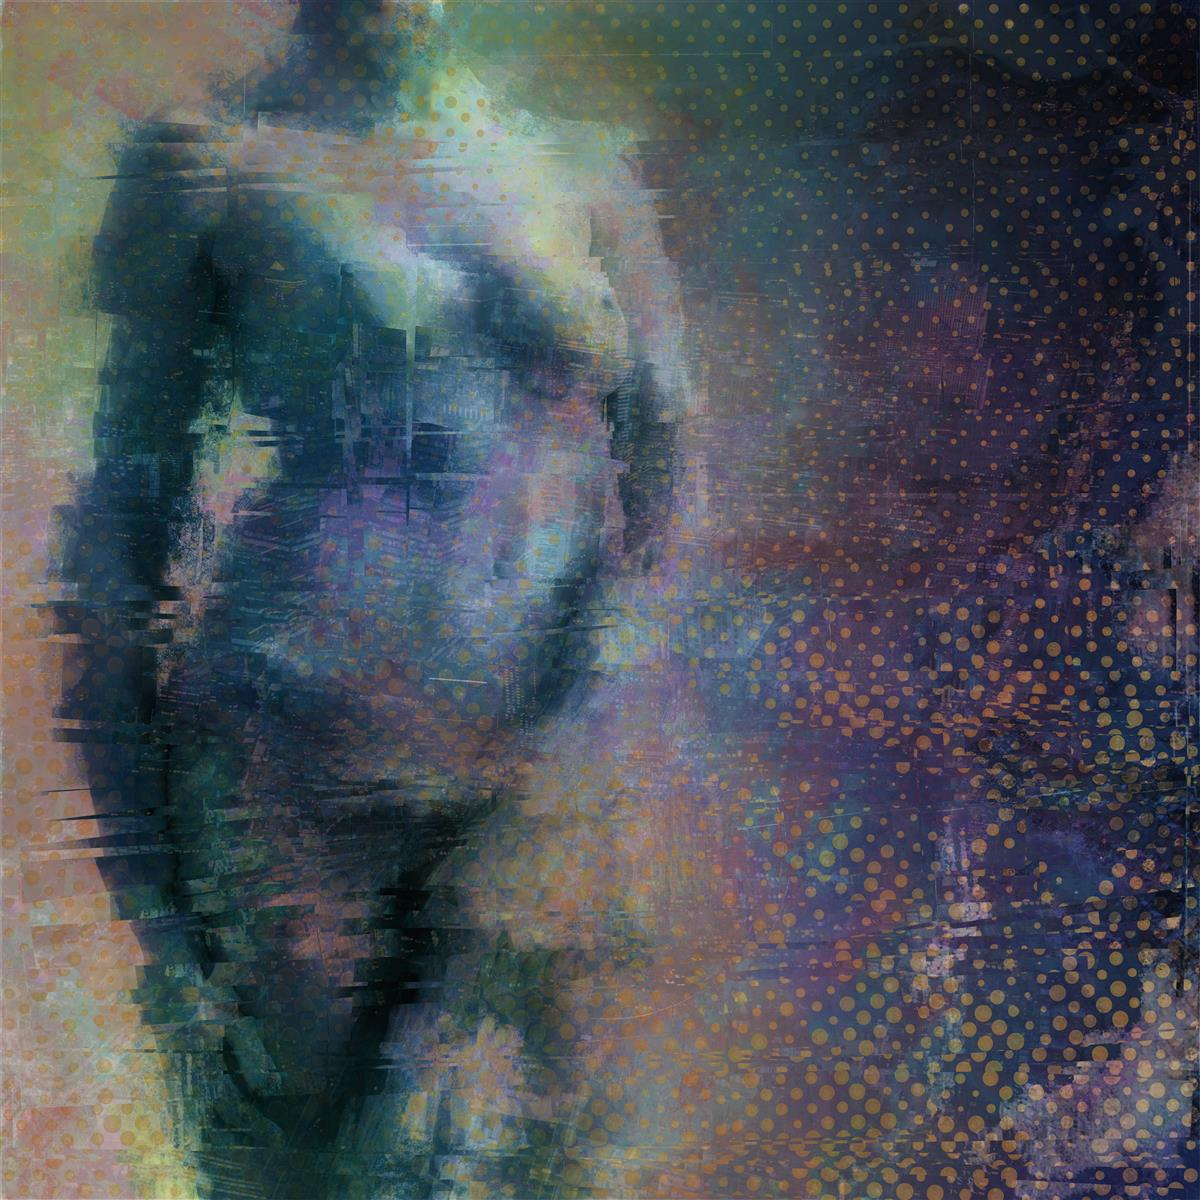 torso R, digital collage, original digital UV print up to 148x148cm, 2018